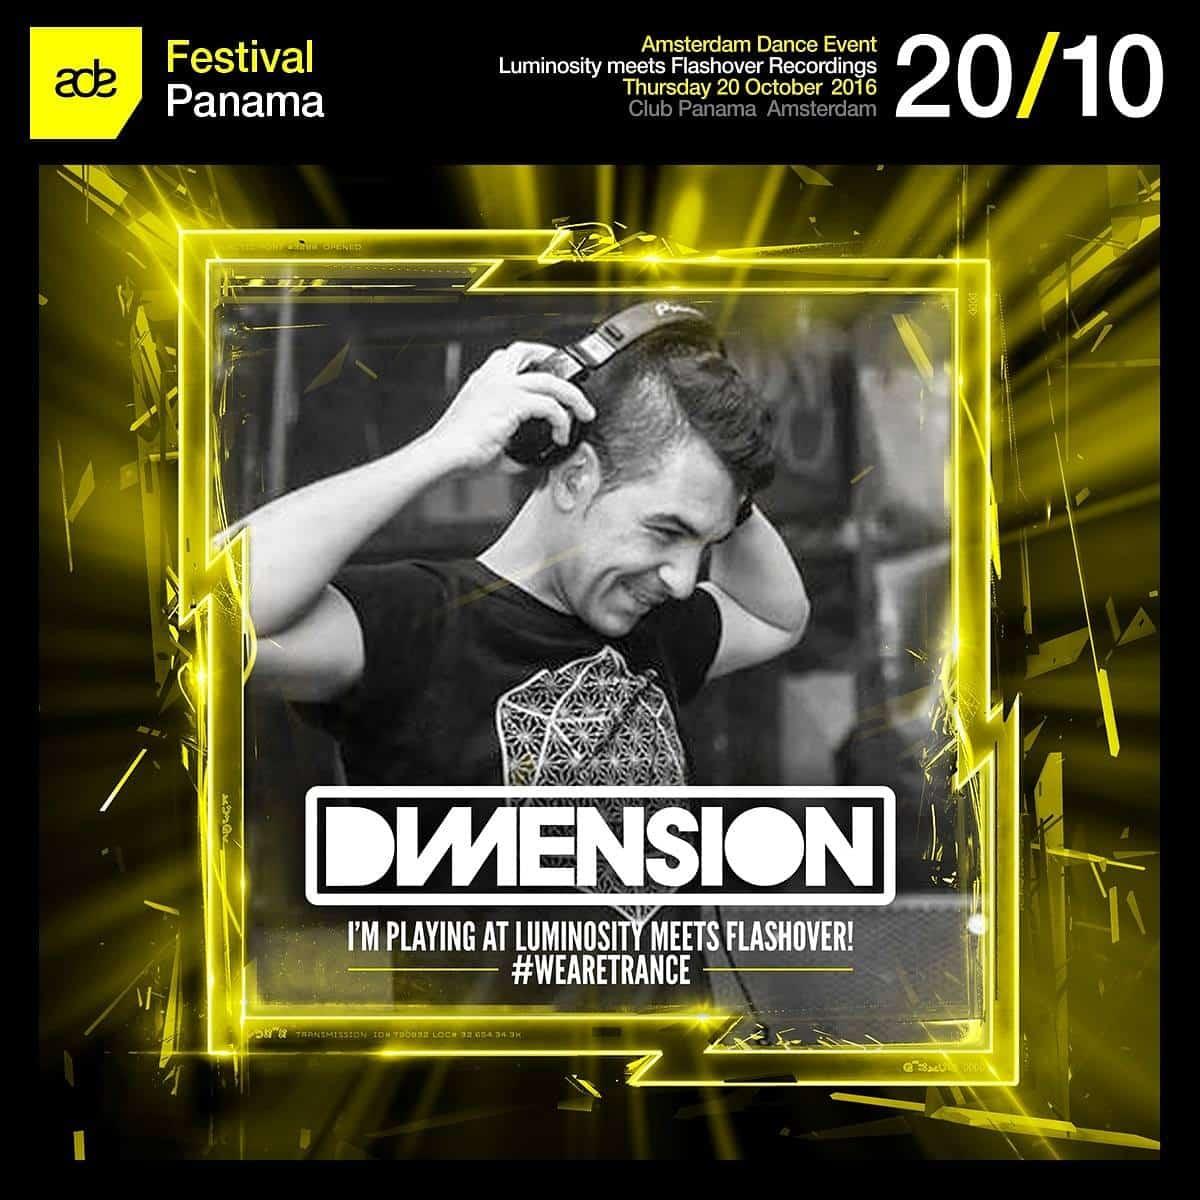 Dimension live at Luminosity meets Flashover Recordings (20.10.2016) @ Amsterdam, Netherlands